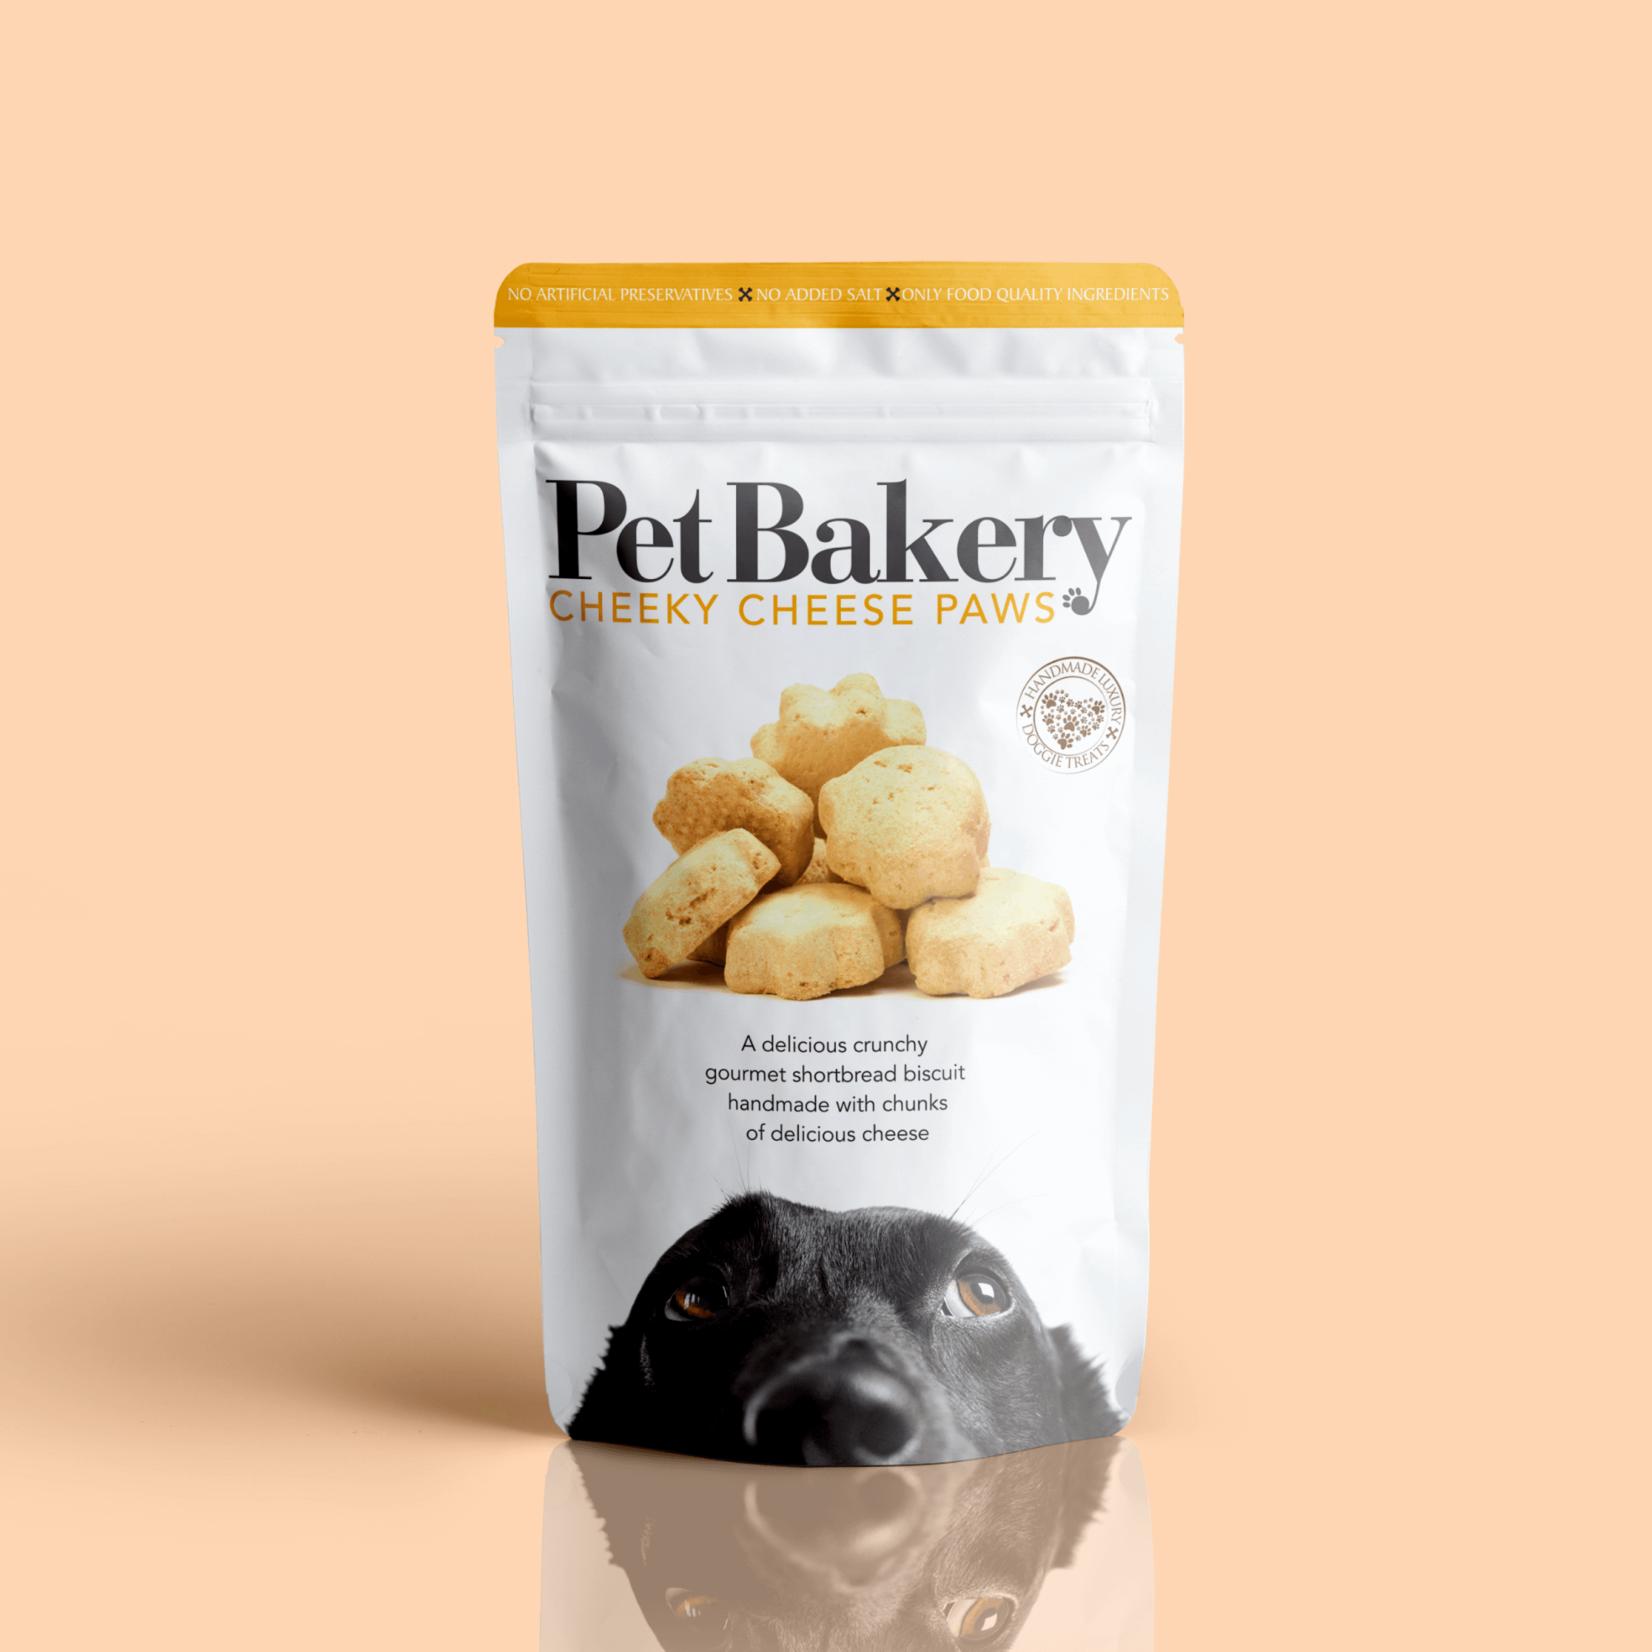 Pet Bakery Cheeky Cheese Paws Dog Treats, 190g